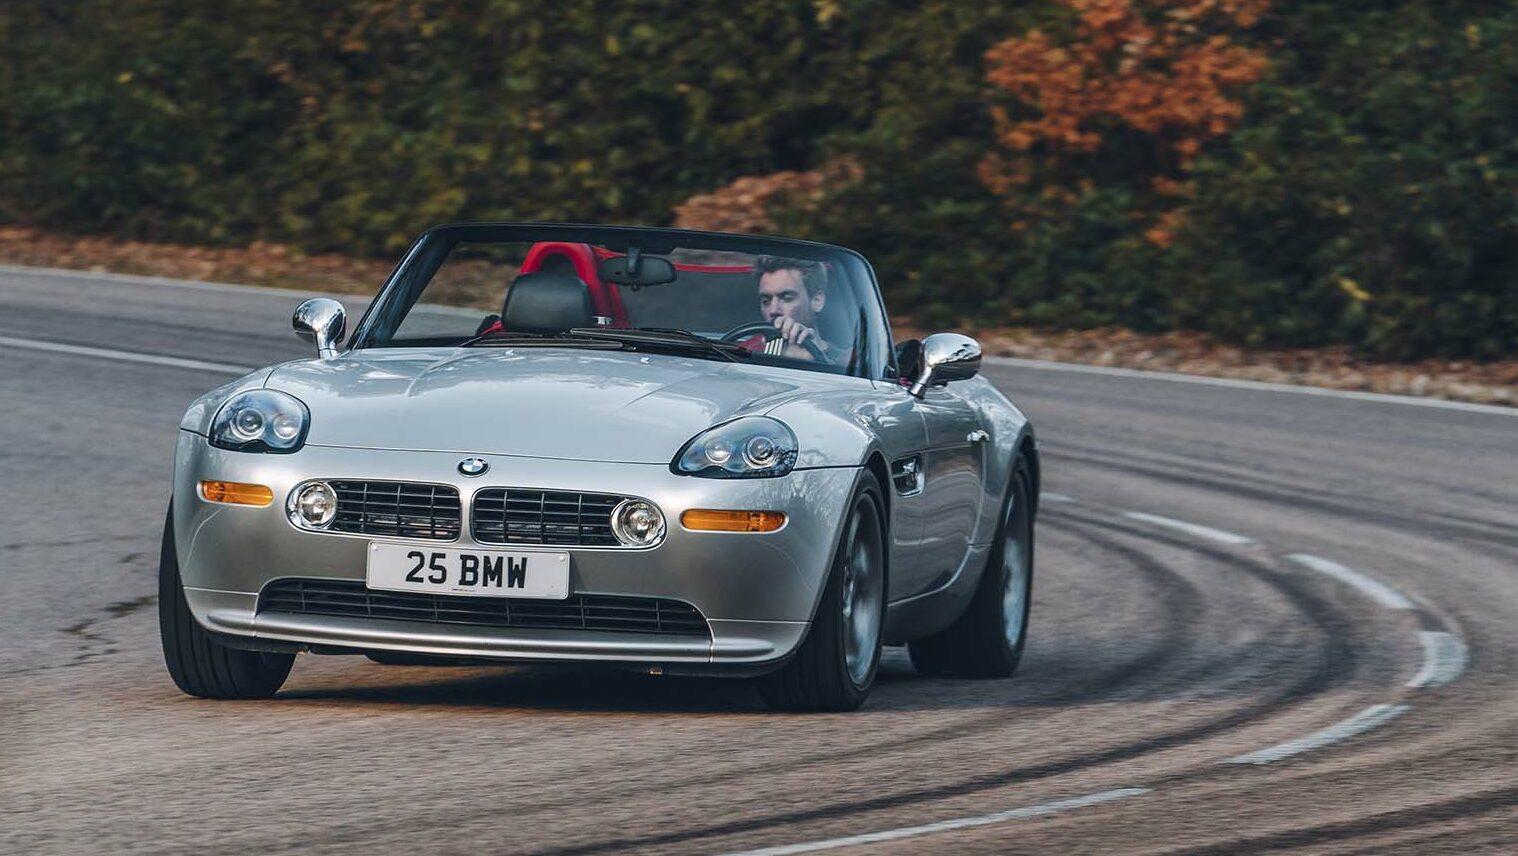 BMW Z8 van James Bond (007)